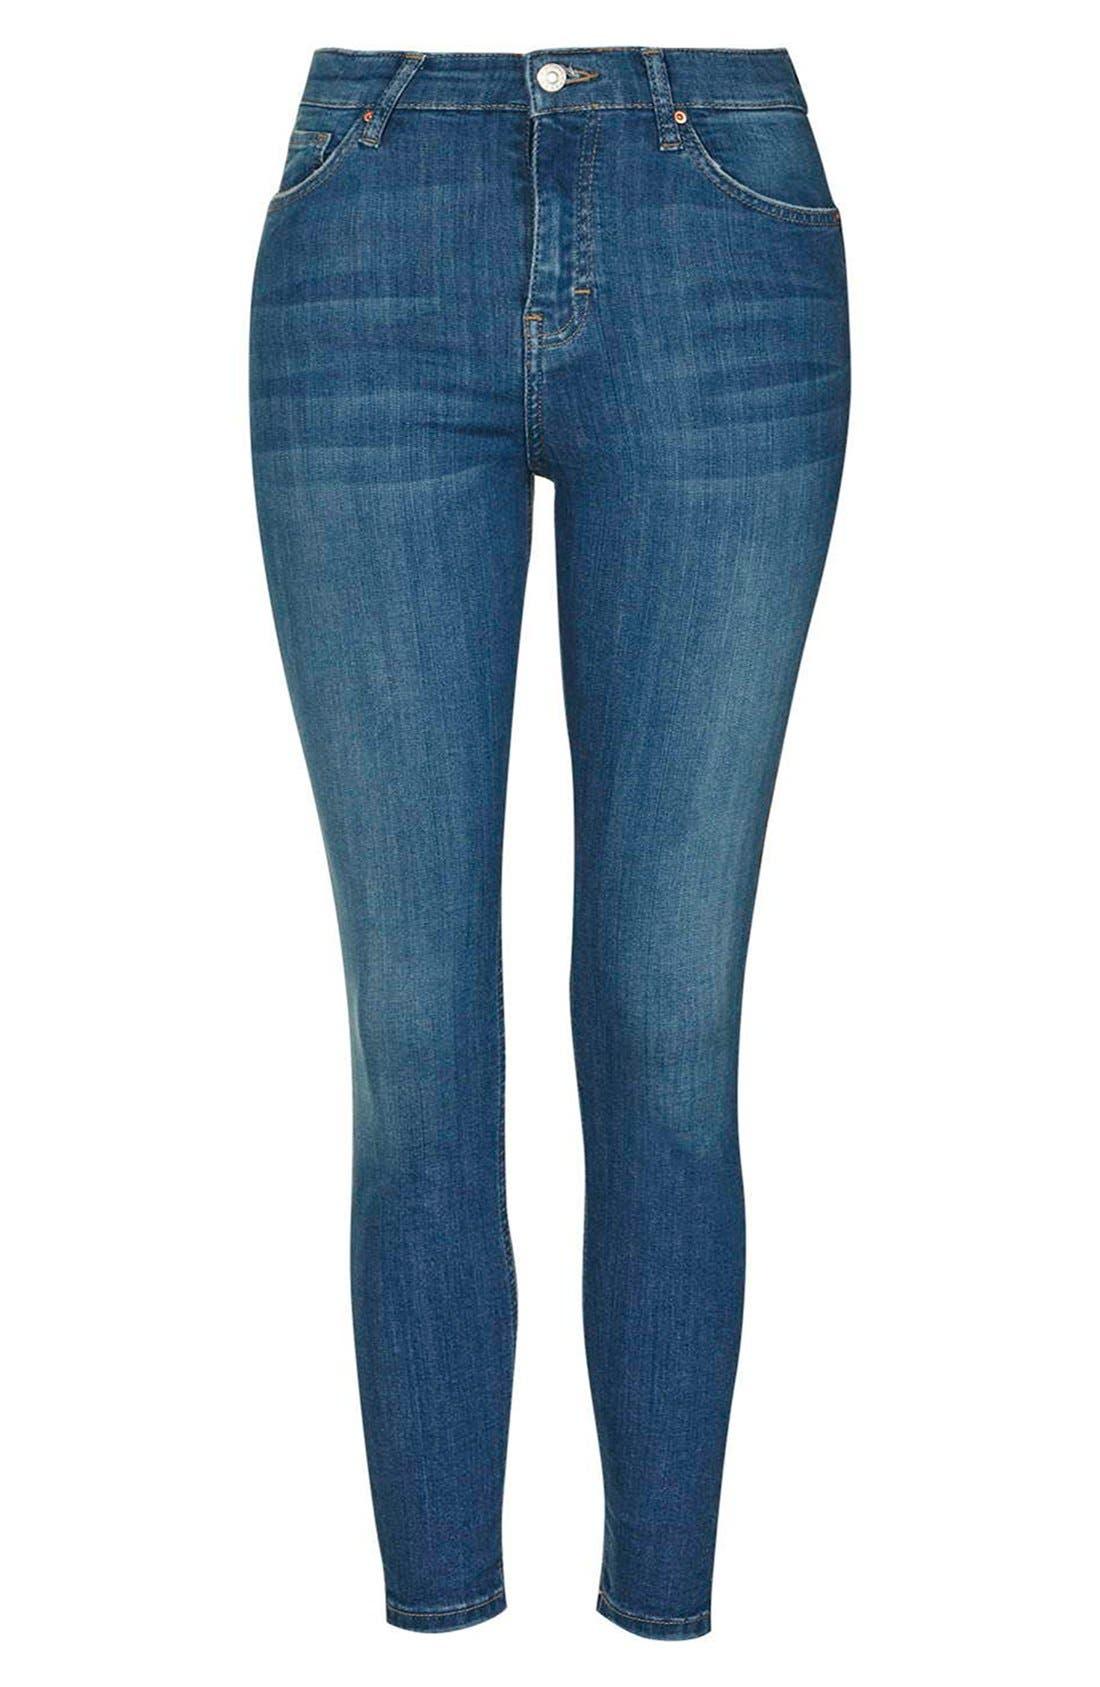 'Jamie' High Waist Ankle Skinny Jeans,                             Alternate thumbnail 6, color,                             400